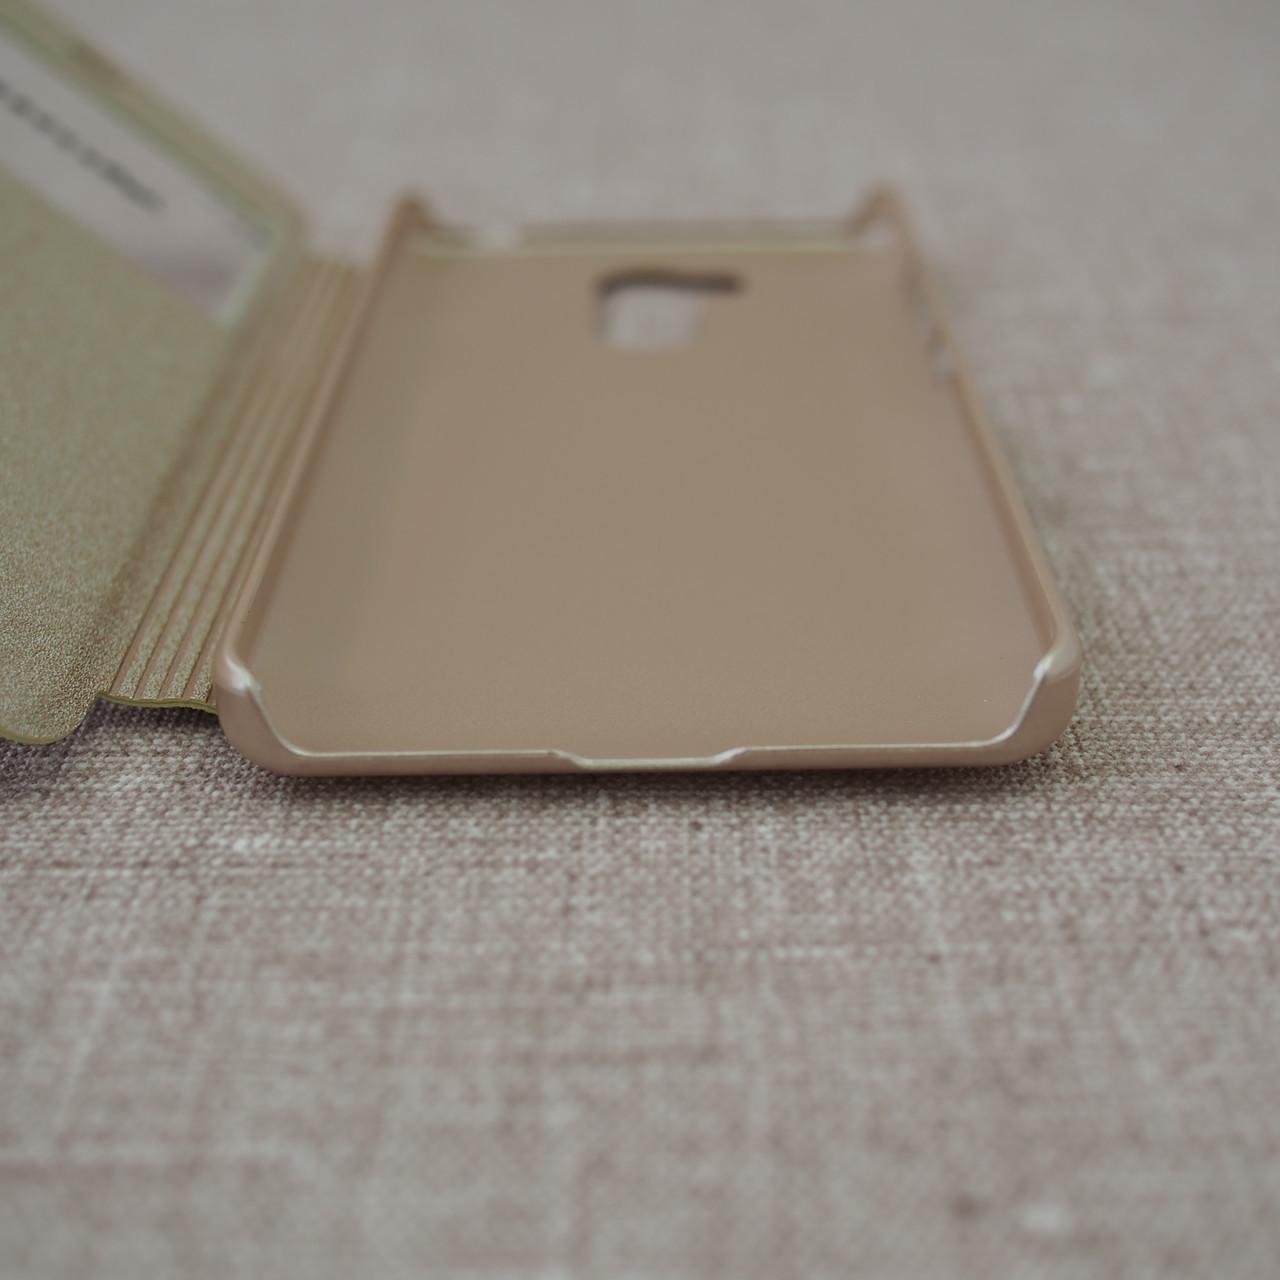 Чехол Nillkin Sparkle Xiaomi Redmi 4 Pro gold Prime Для телефона